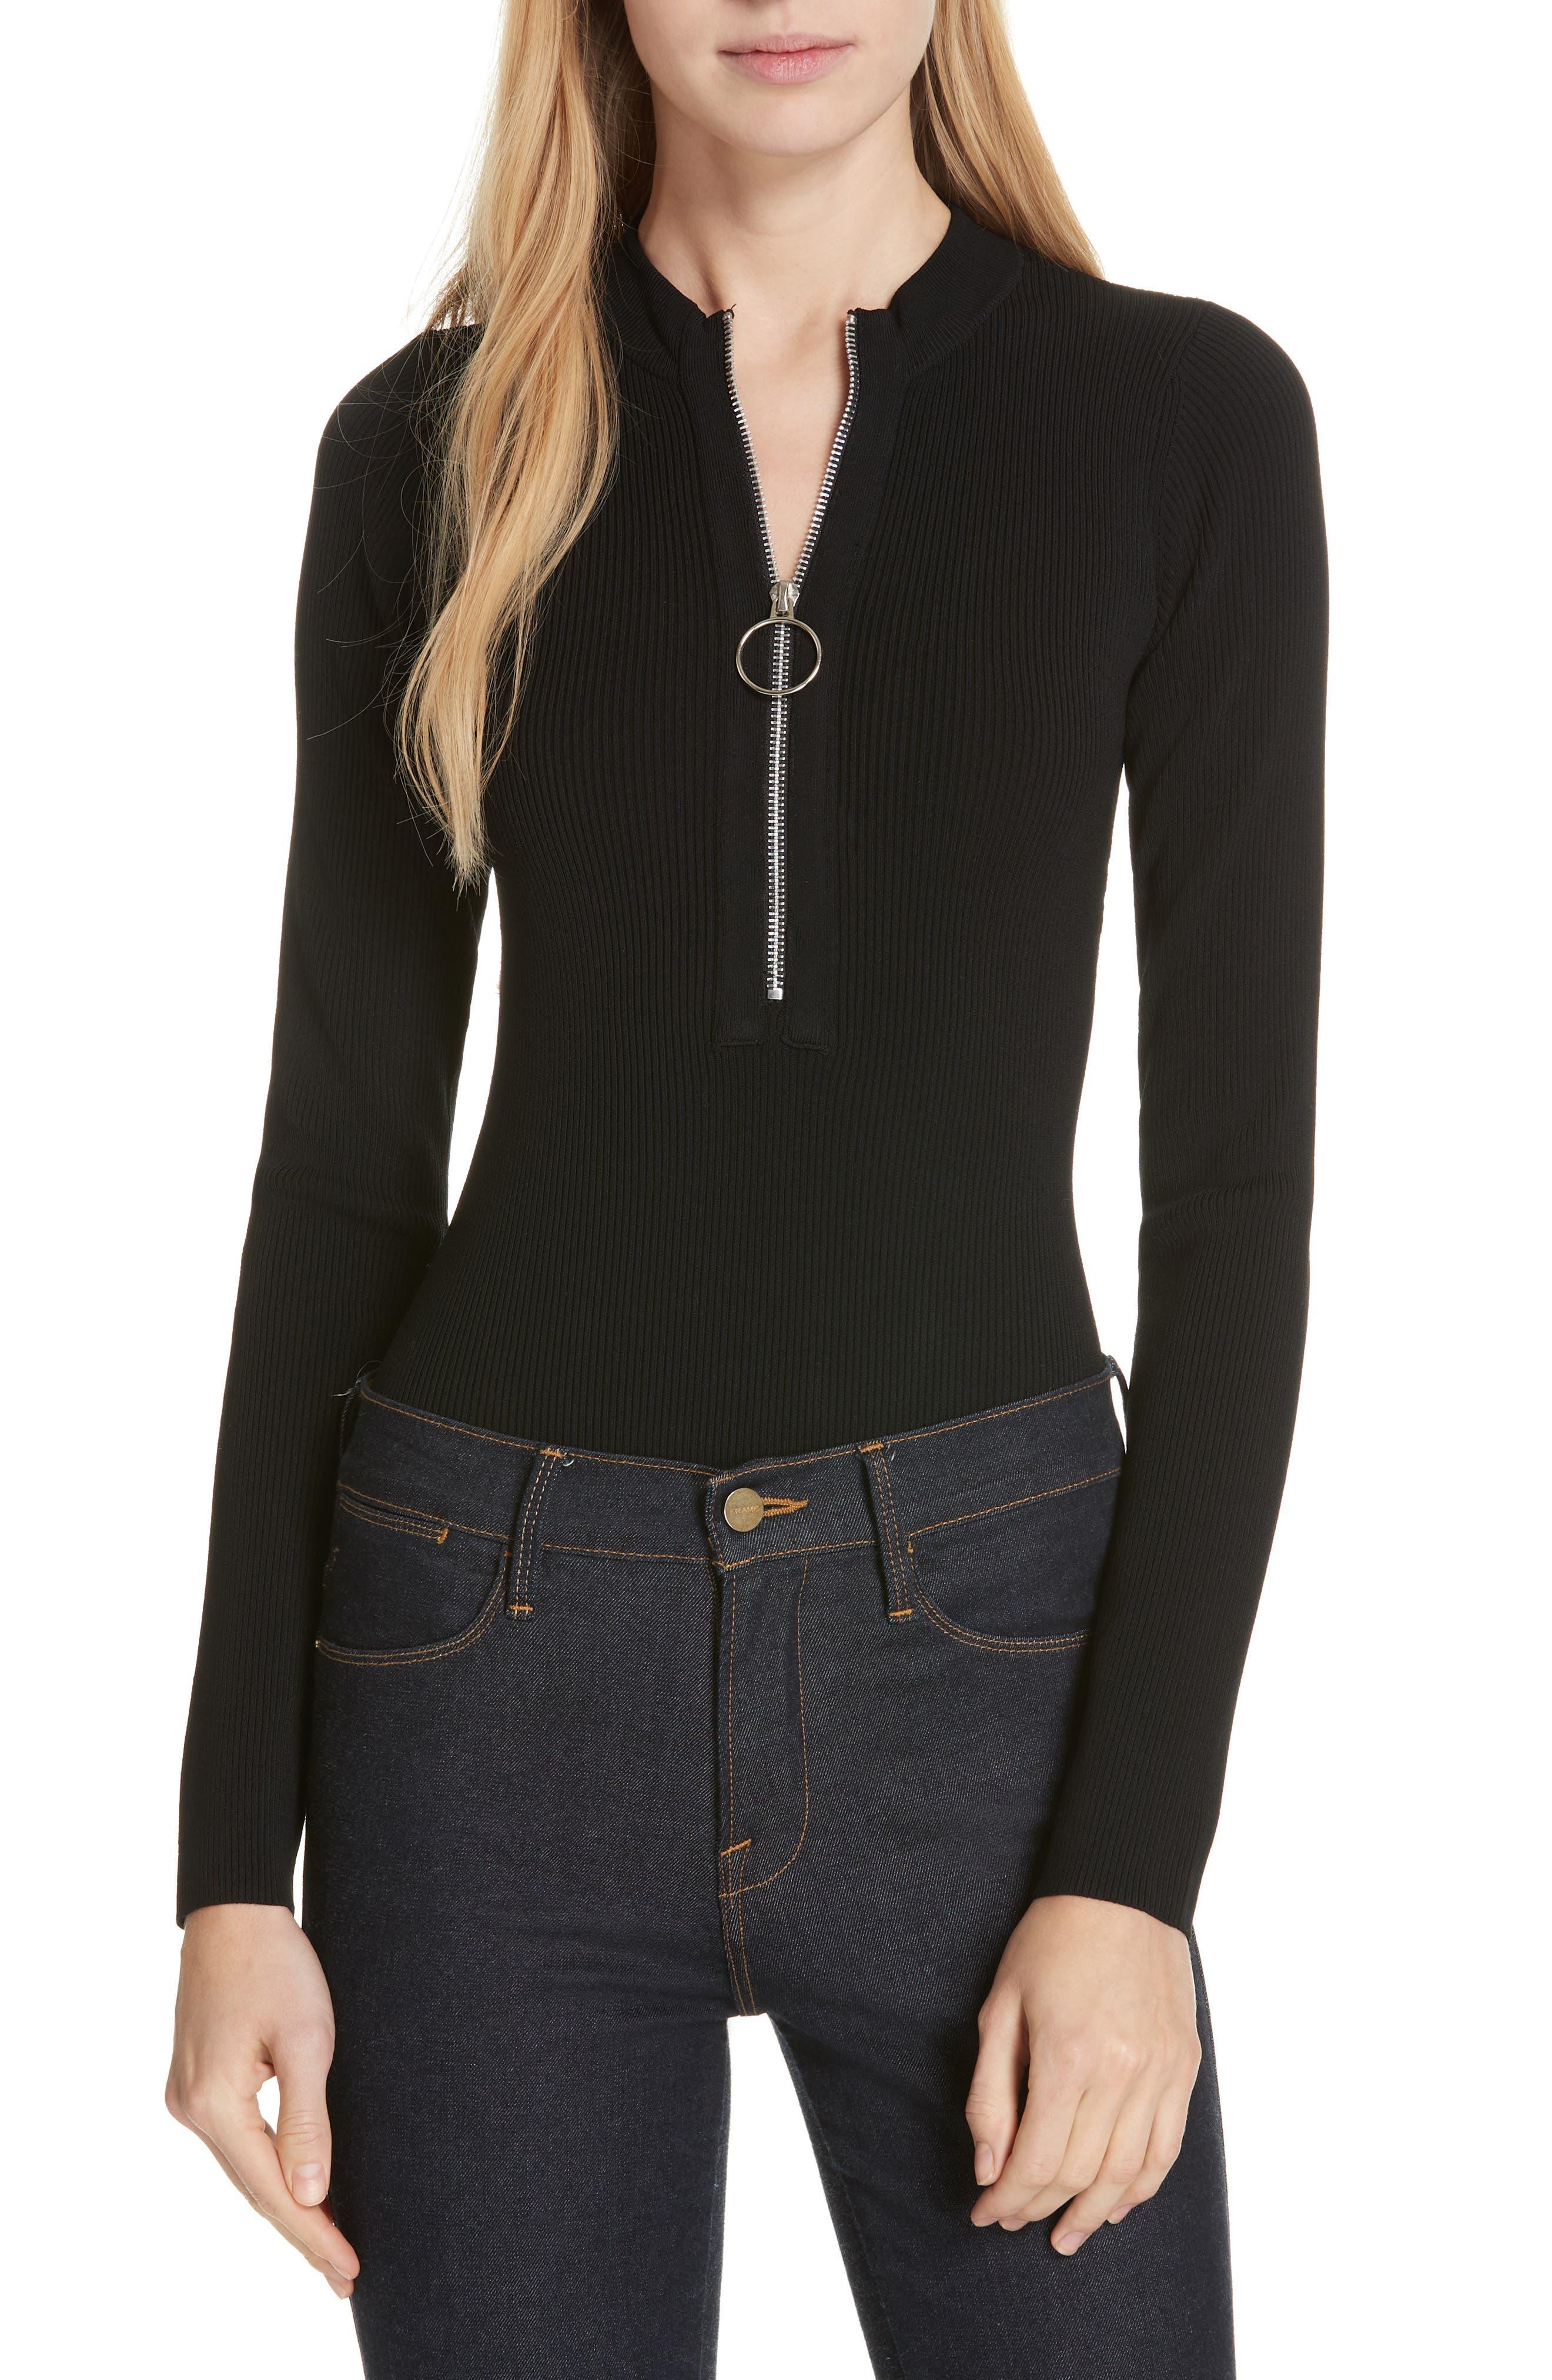 Nicholas Milano Knit Bodysuit, Black